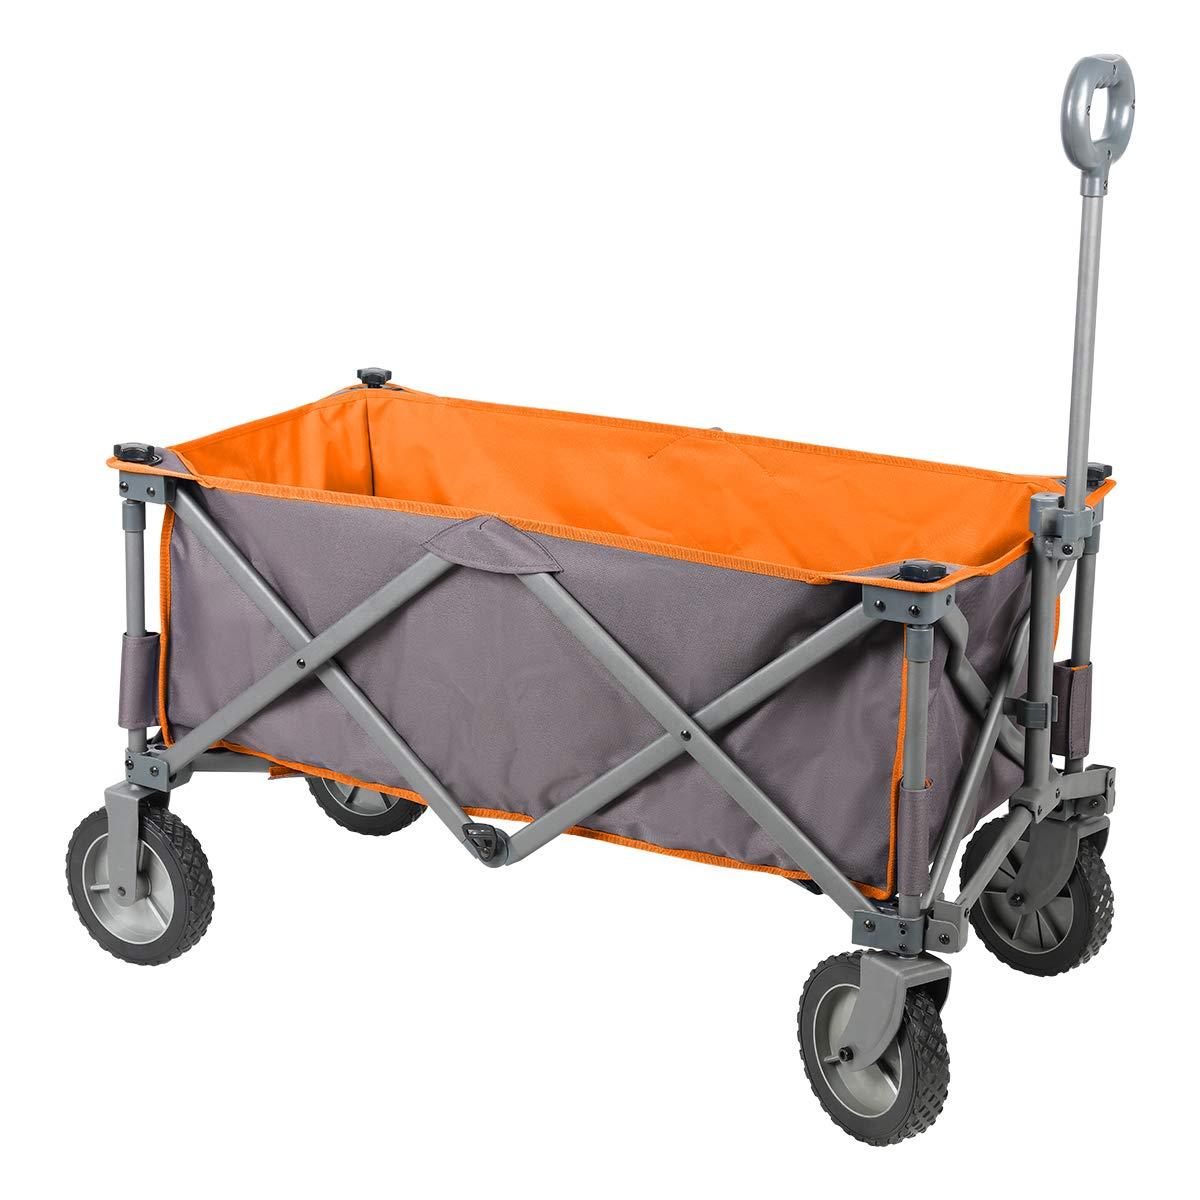 Eurmax Sports Collapsible Sturdy Beach Wagon